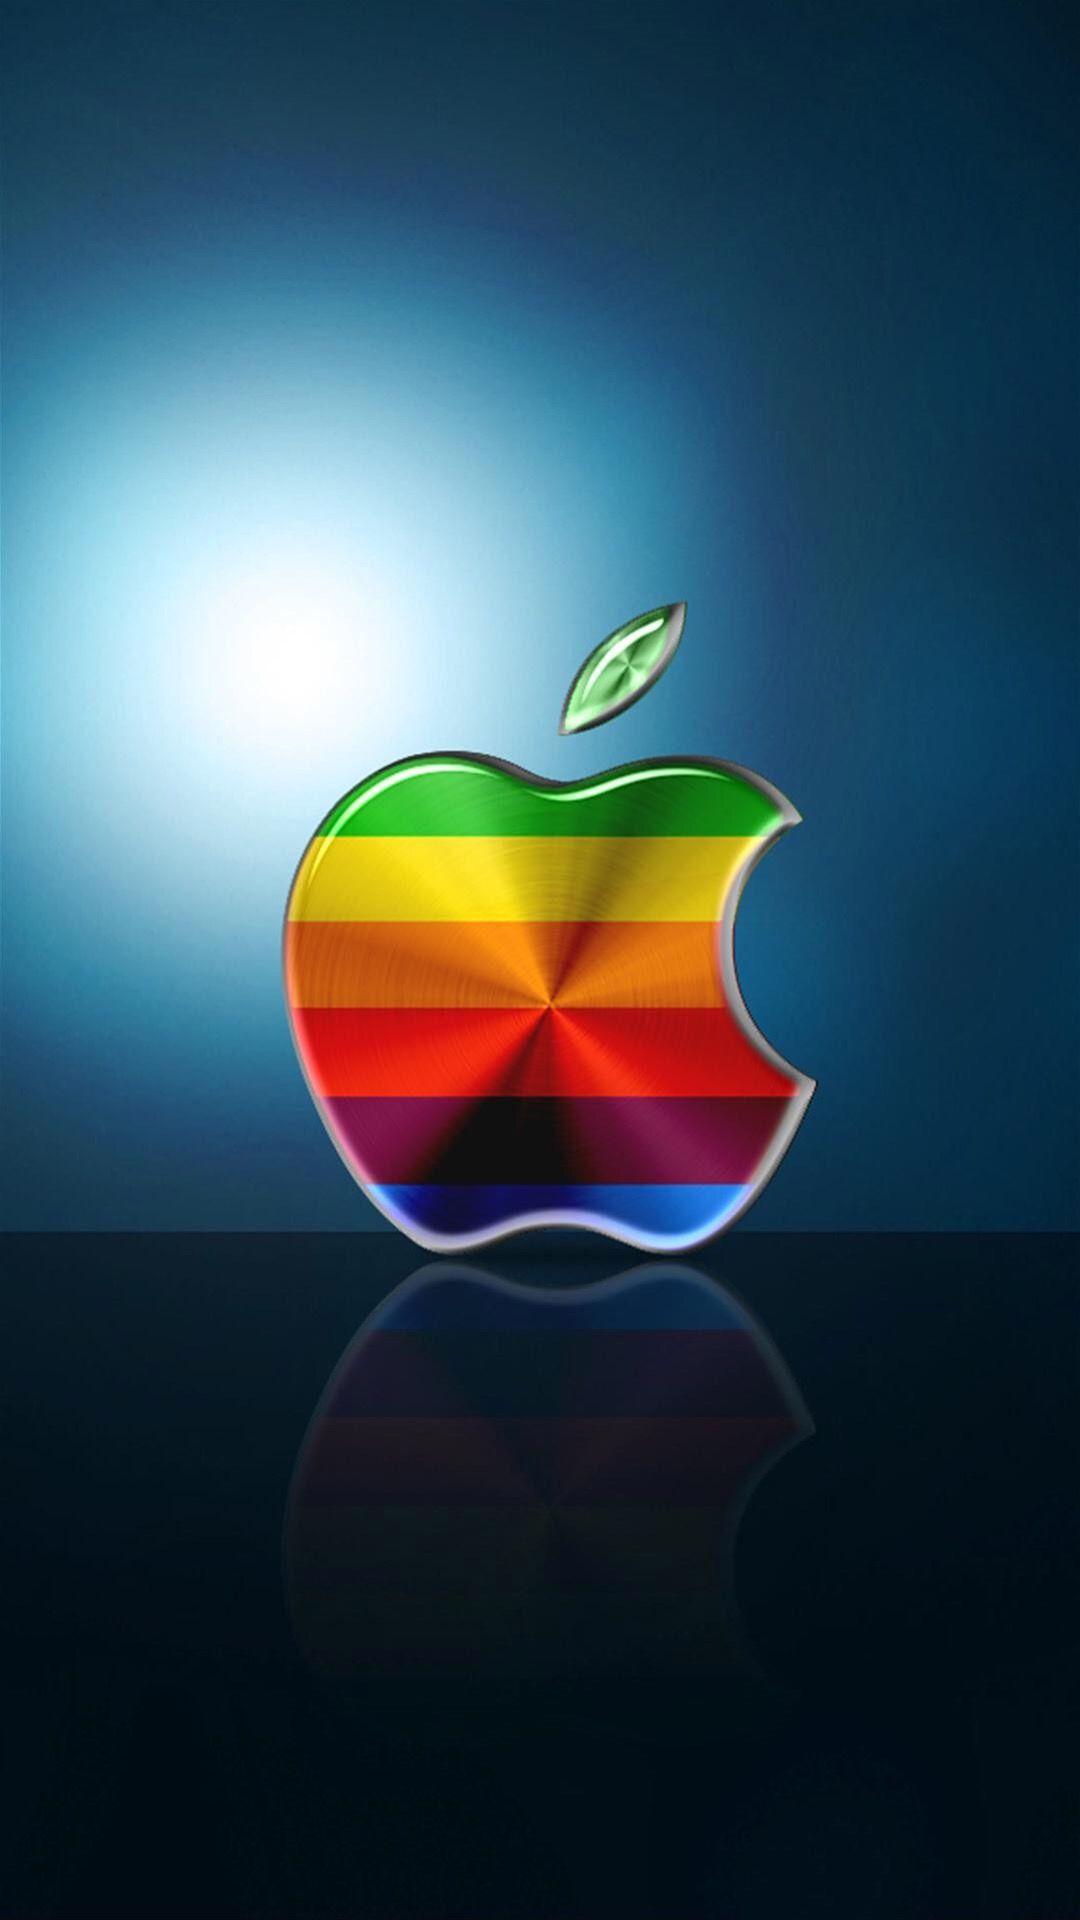 Applelogo Appleiphone Appleipad Ios13 Iphonewallpaper Apple Wallpaper Apple Logo Wallpaper Iphone Apple Wallpaper Iphone